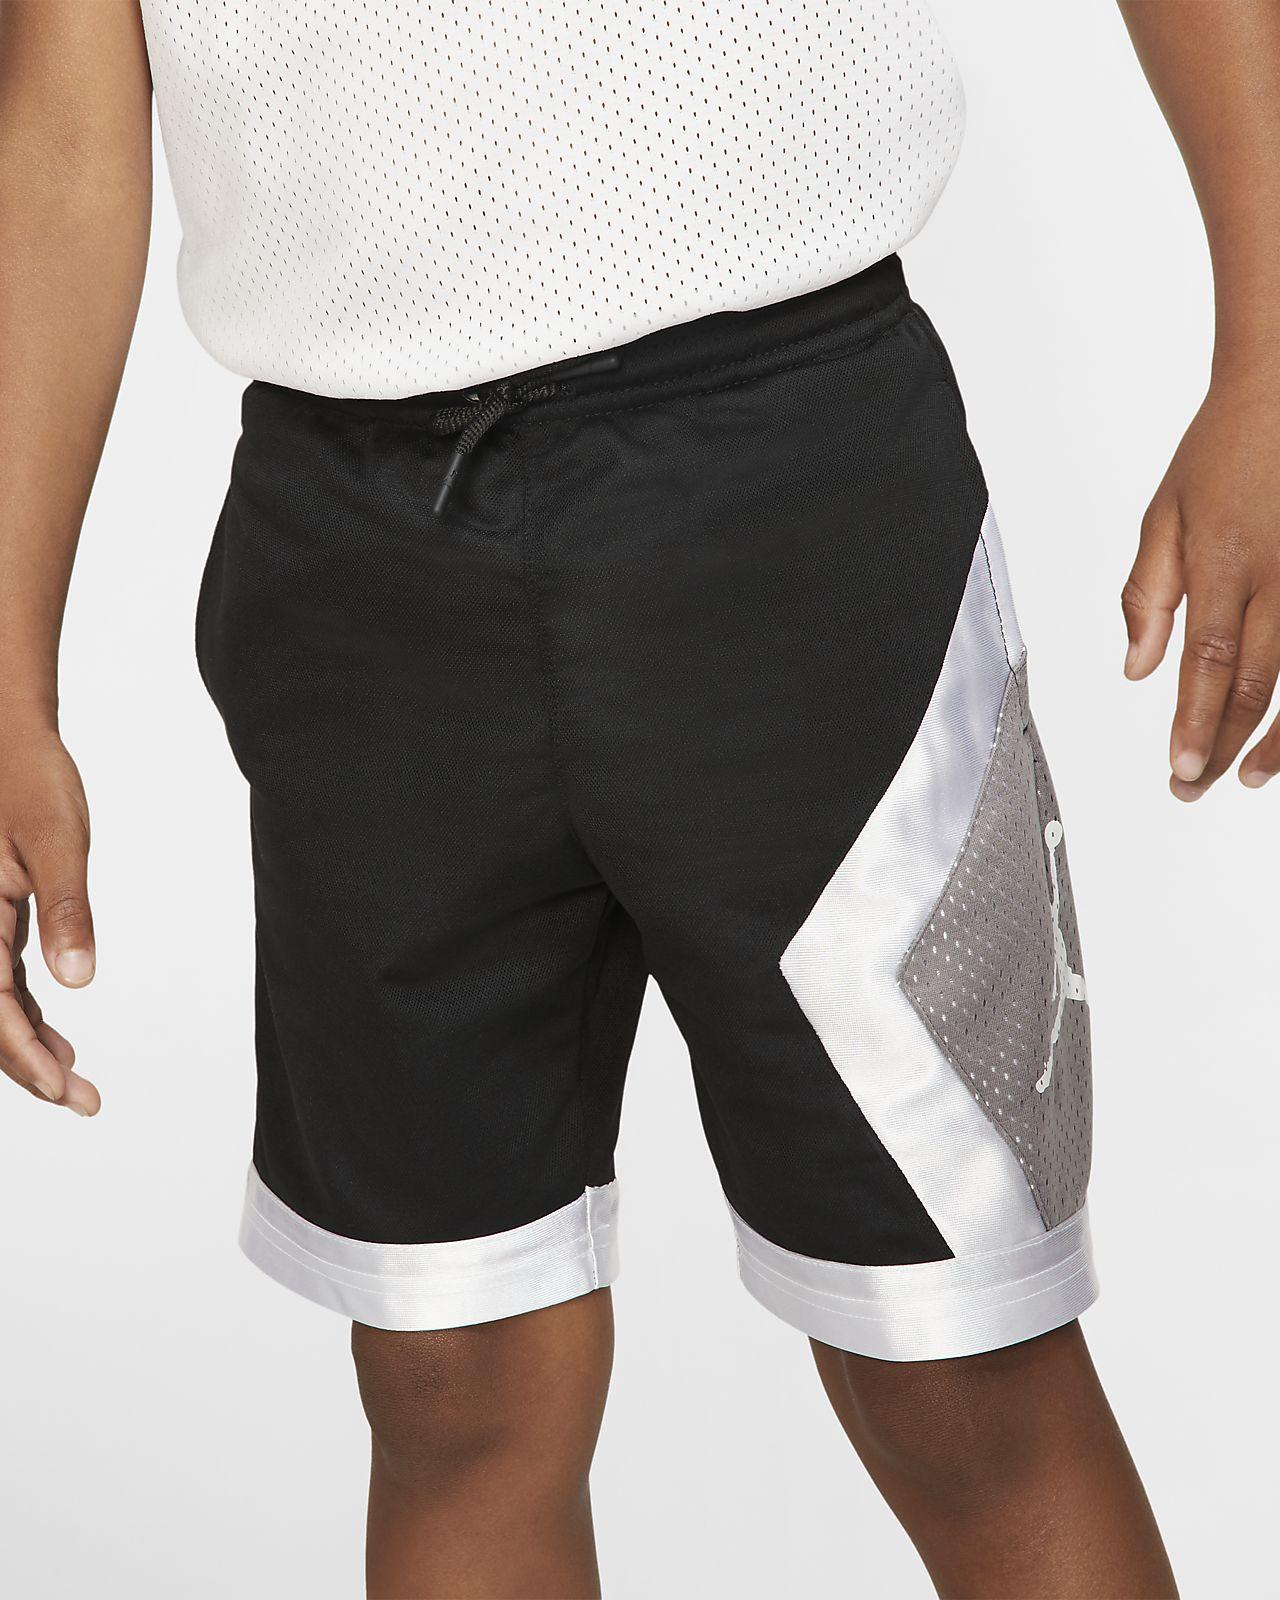 Jordan Dri-FIT Diamond Pantalón corto - Niño/a pequeño/a